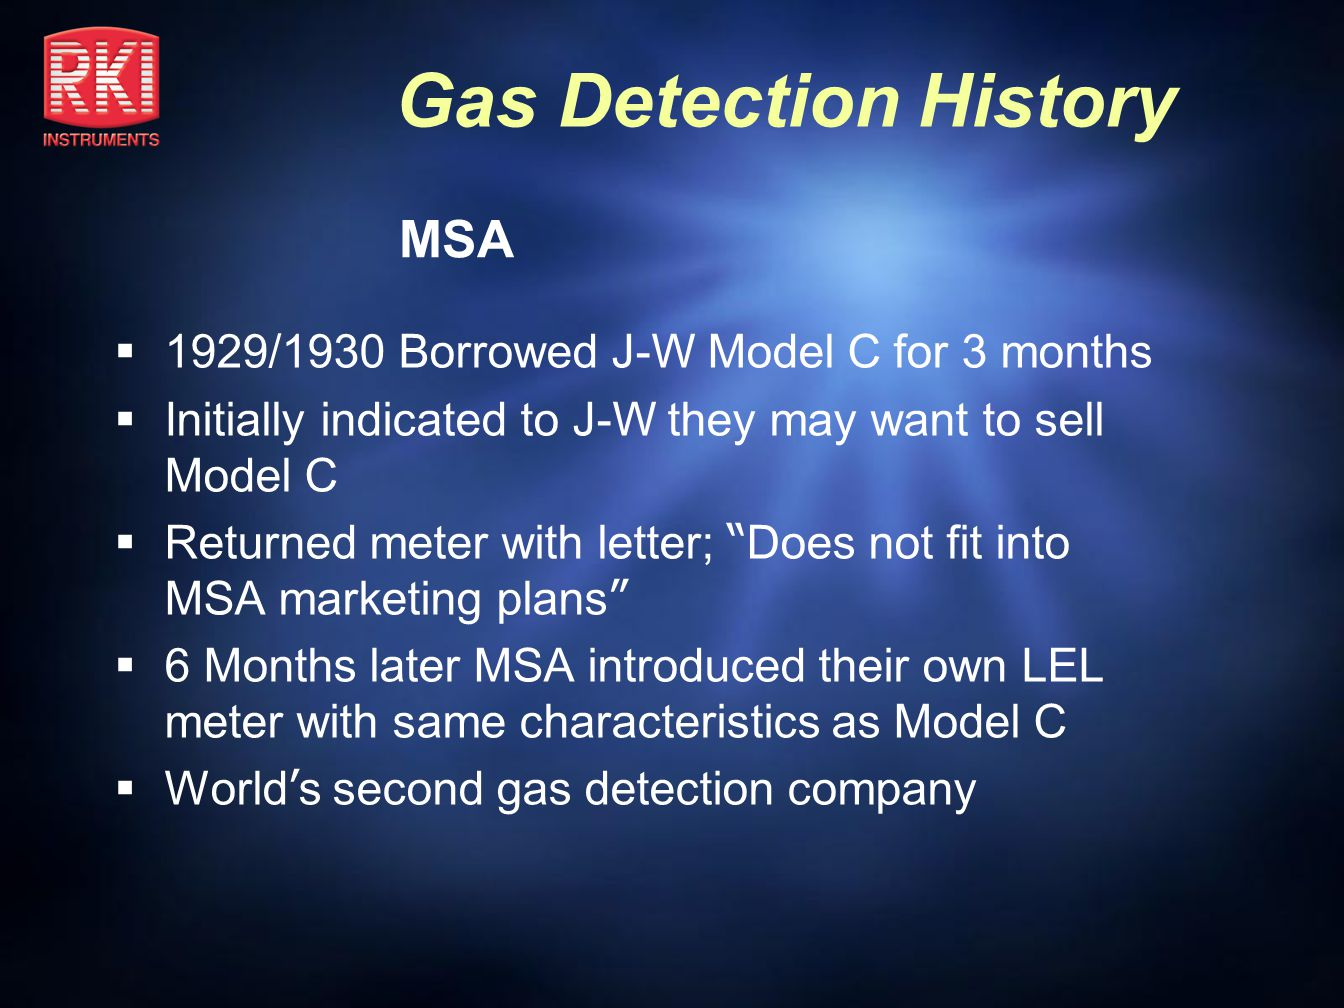 MSA 1929/1930 Borrowed J-W Model C for 3 months